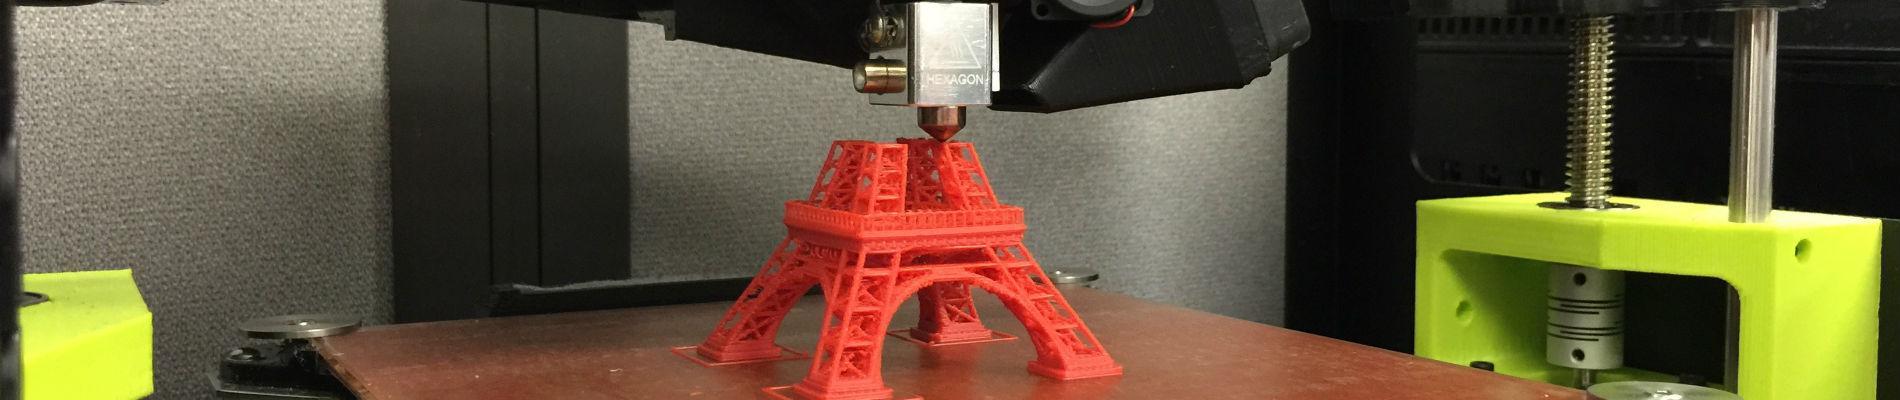 3D Printing Show & Tell